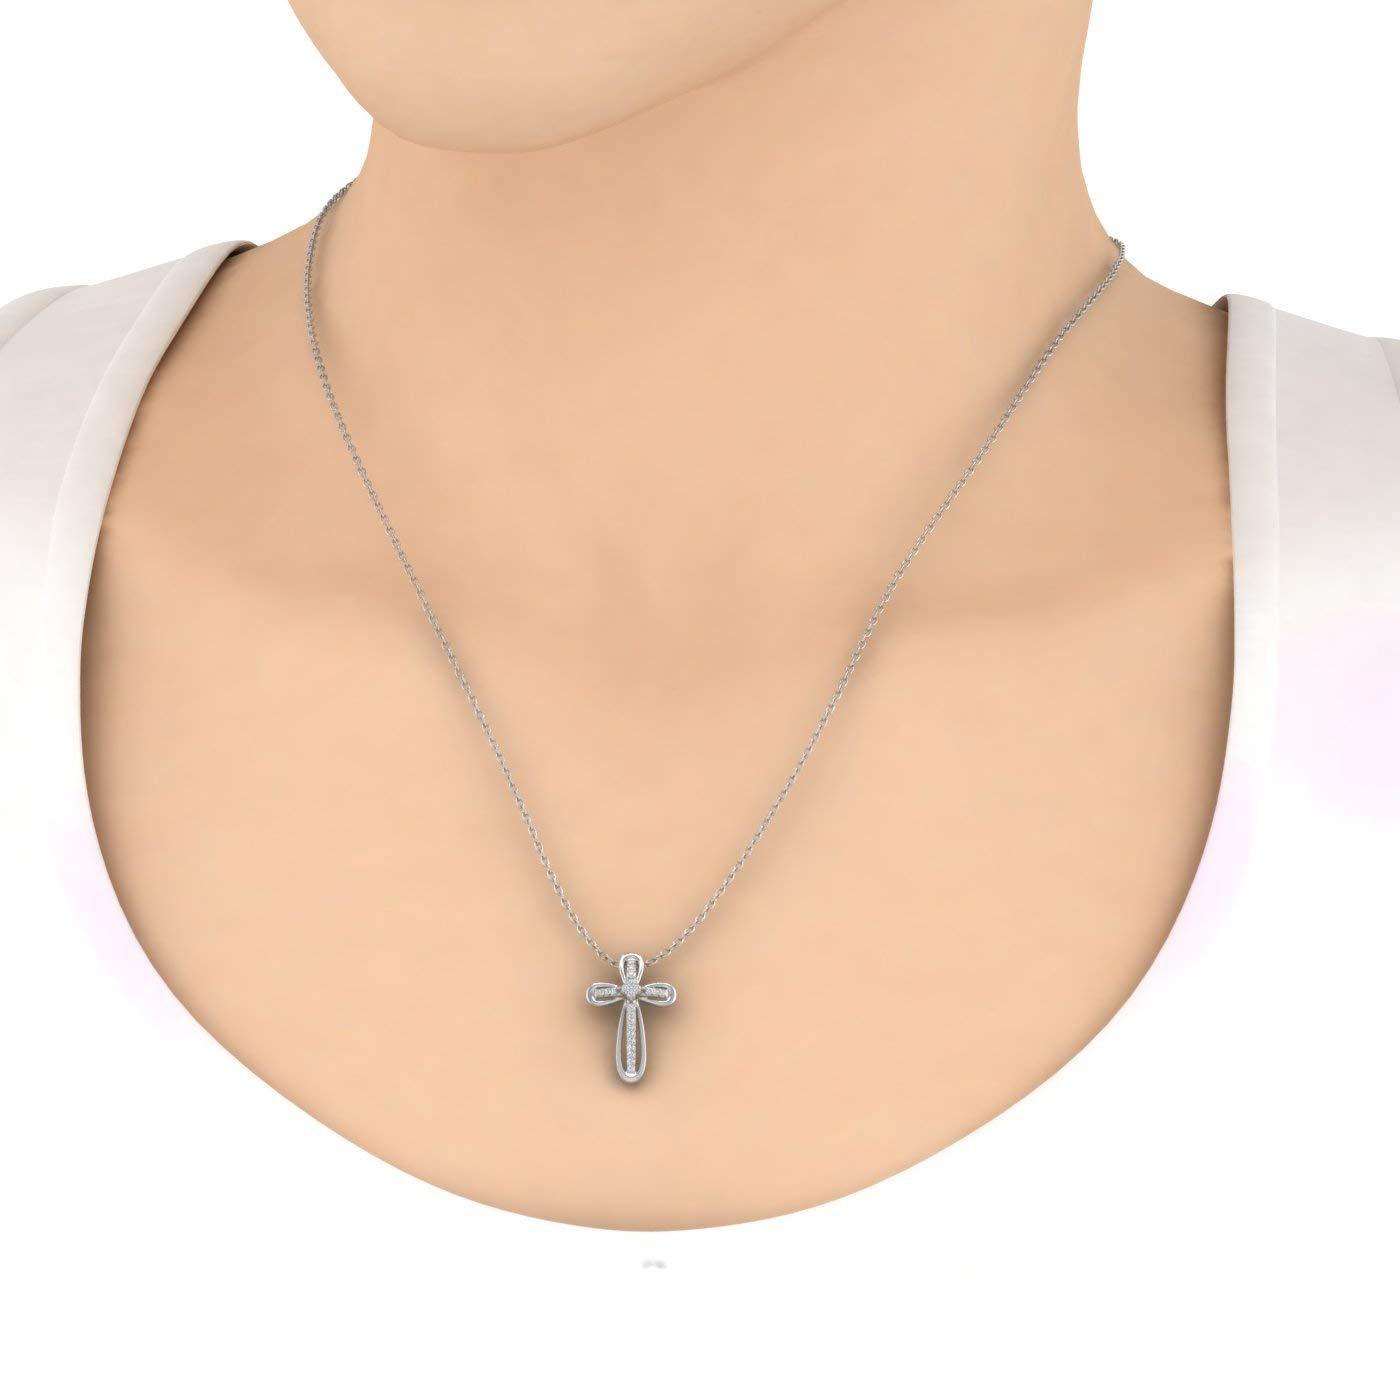 1//5 Carat Diamond Cross Pendant Necklace in 925 Sterling Silver